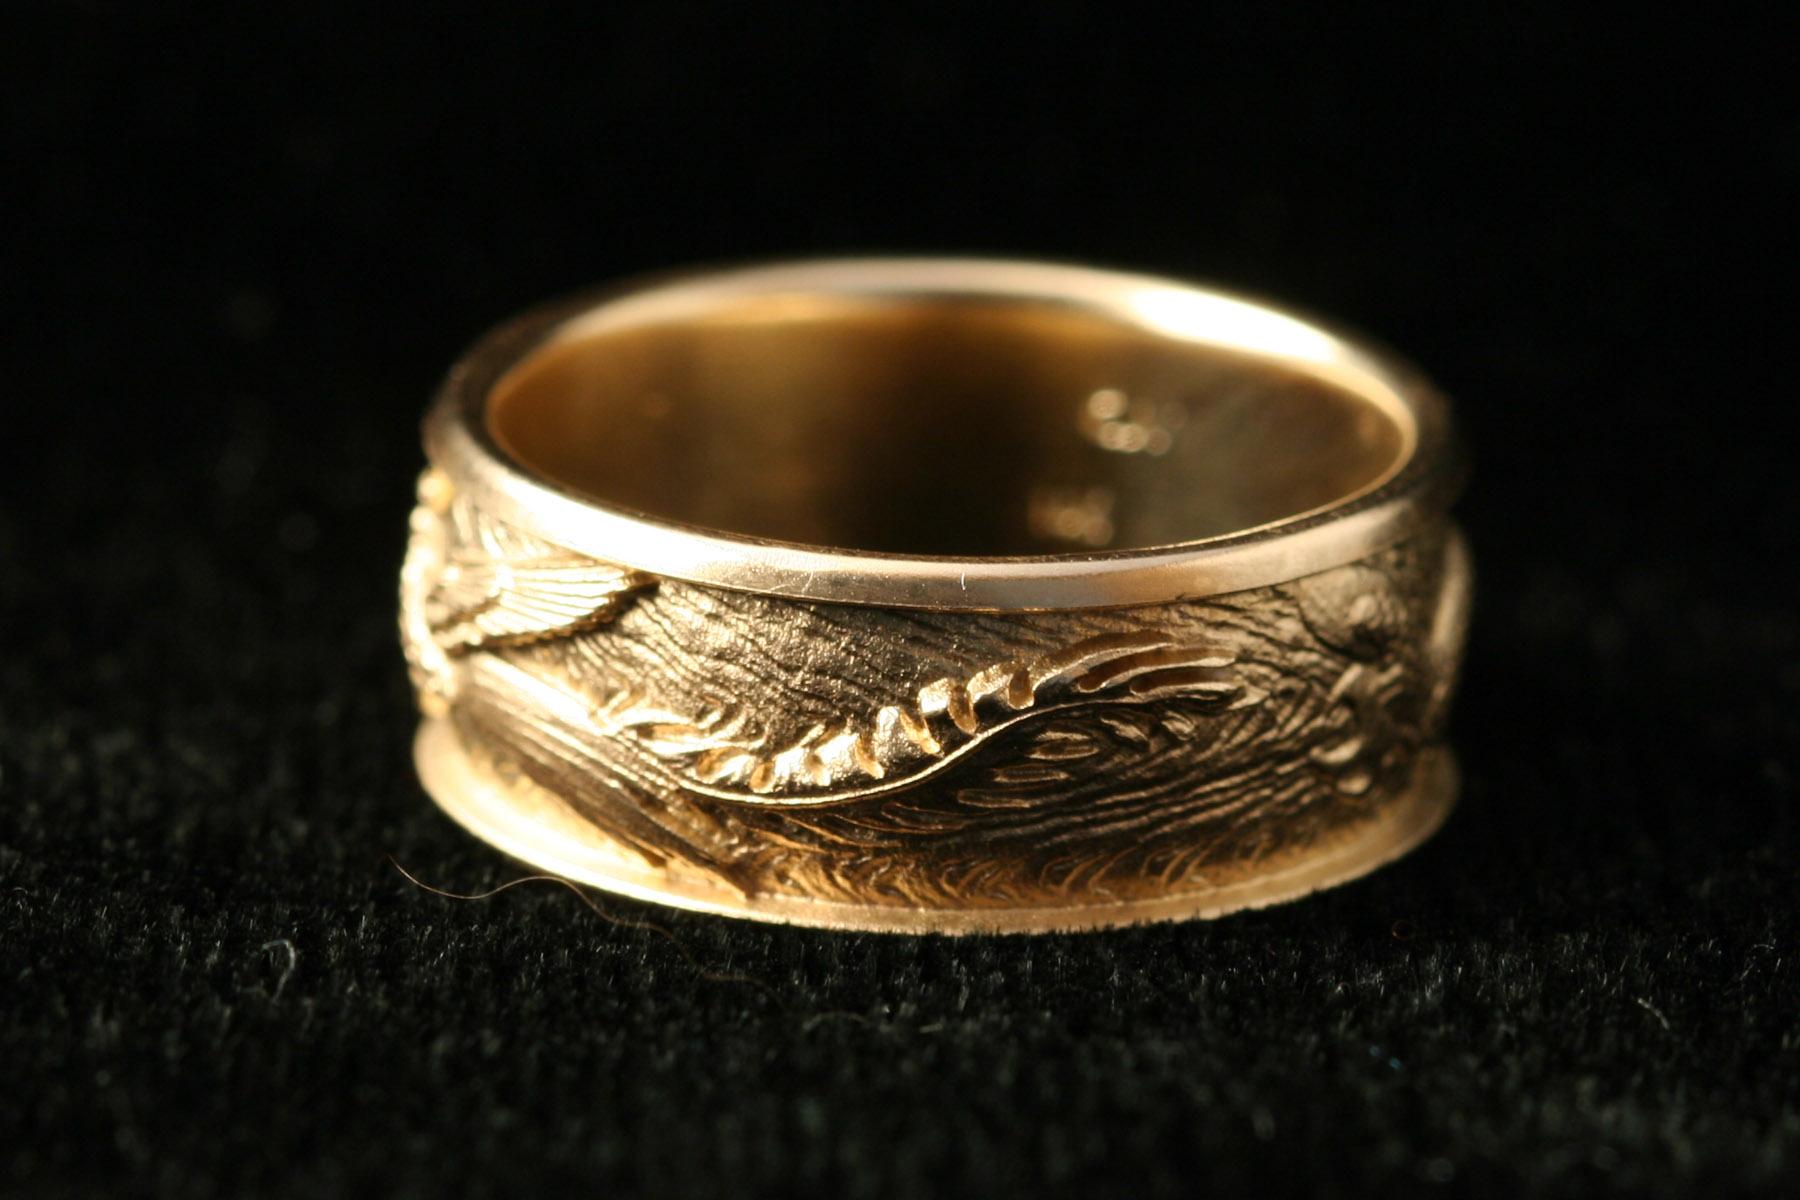 Dragon and phoenix wedding rings